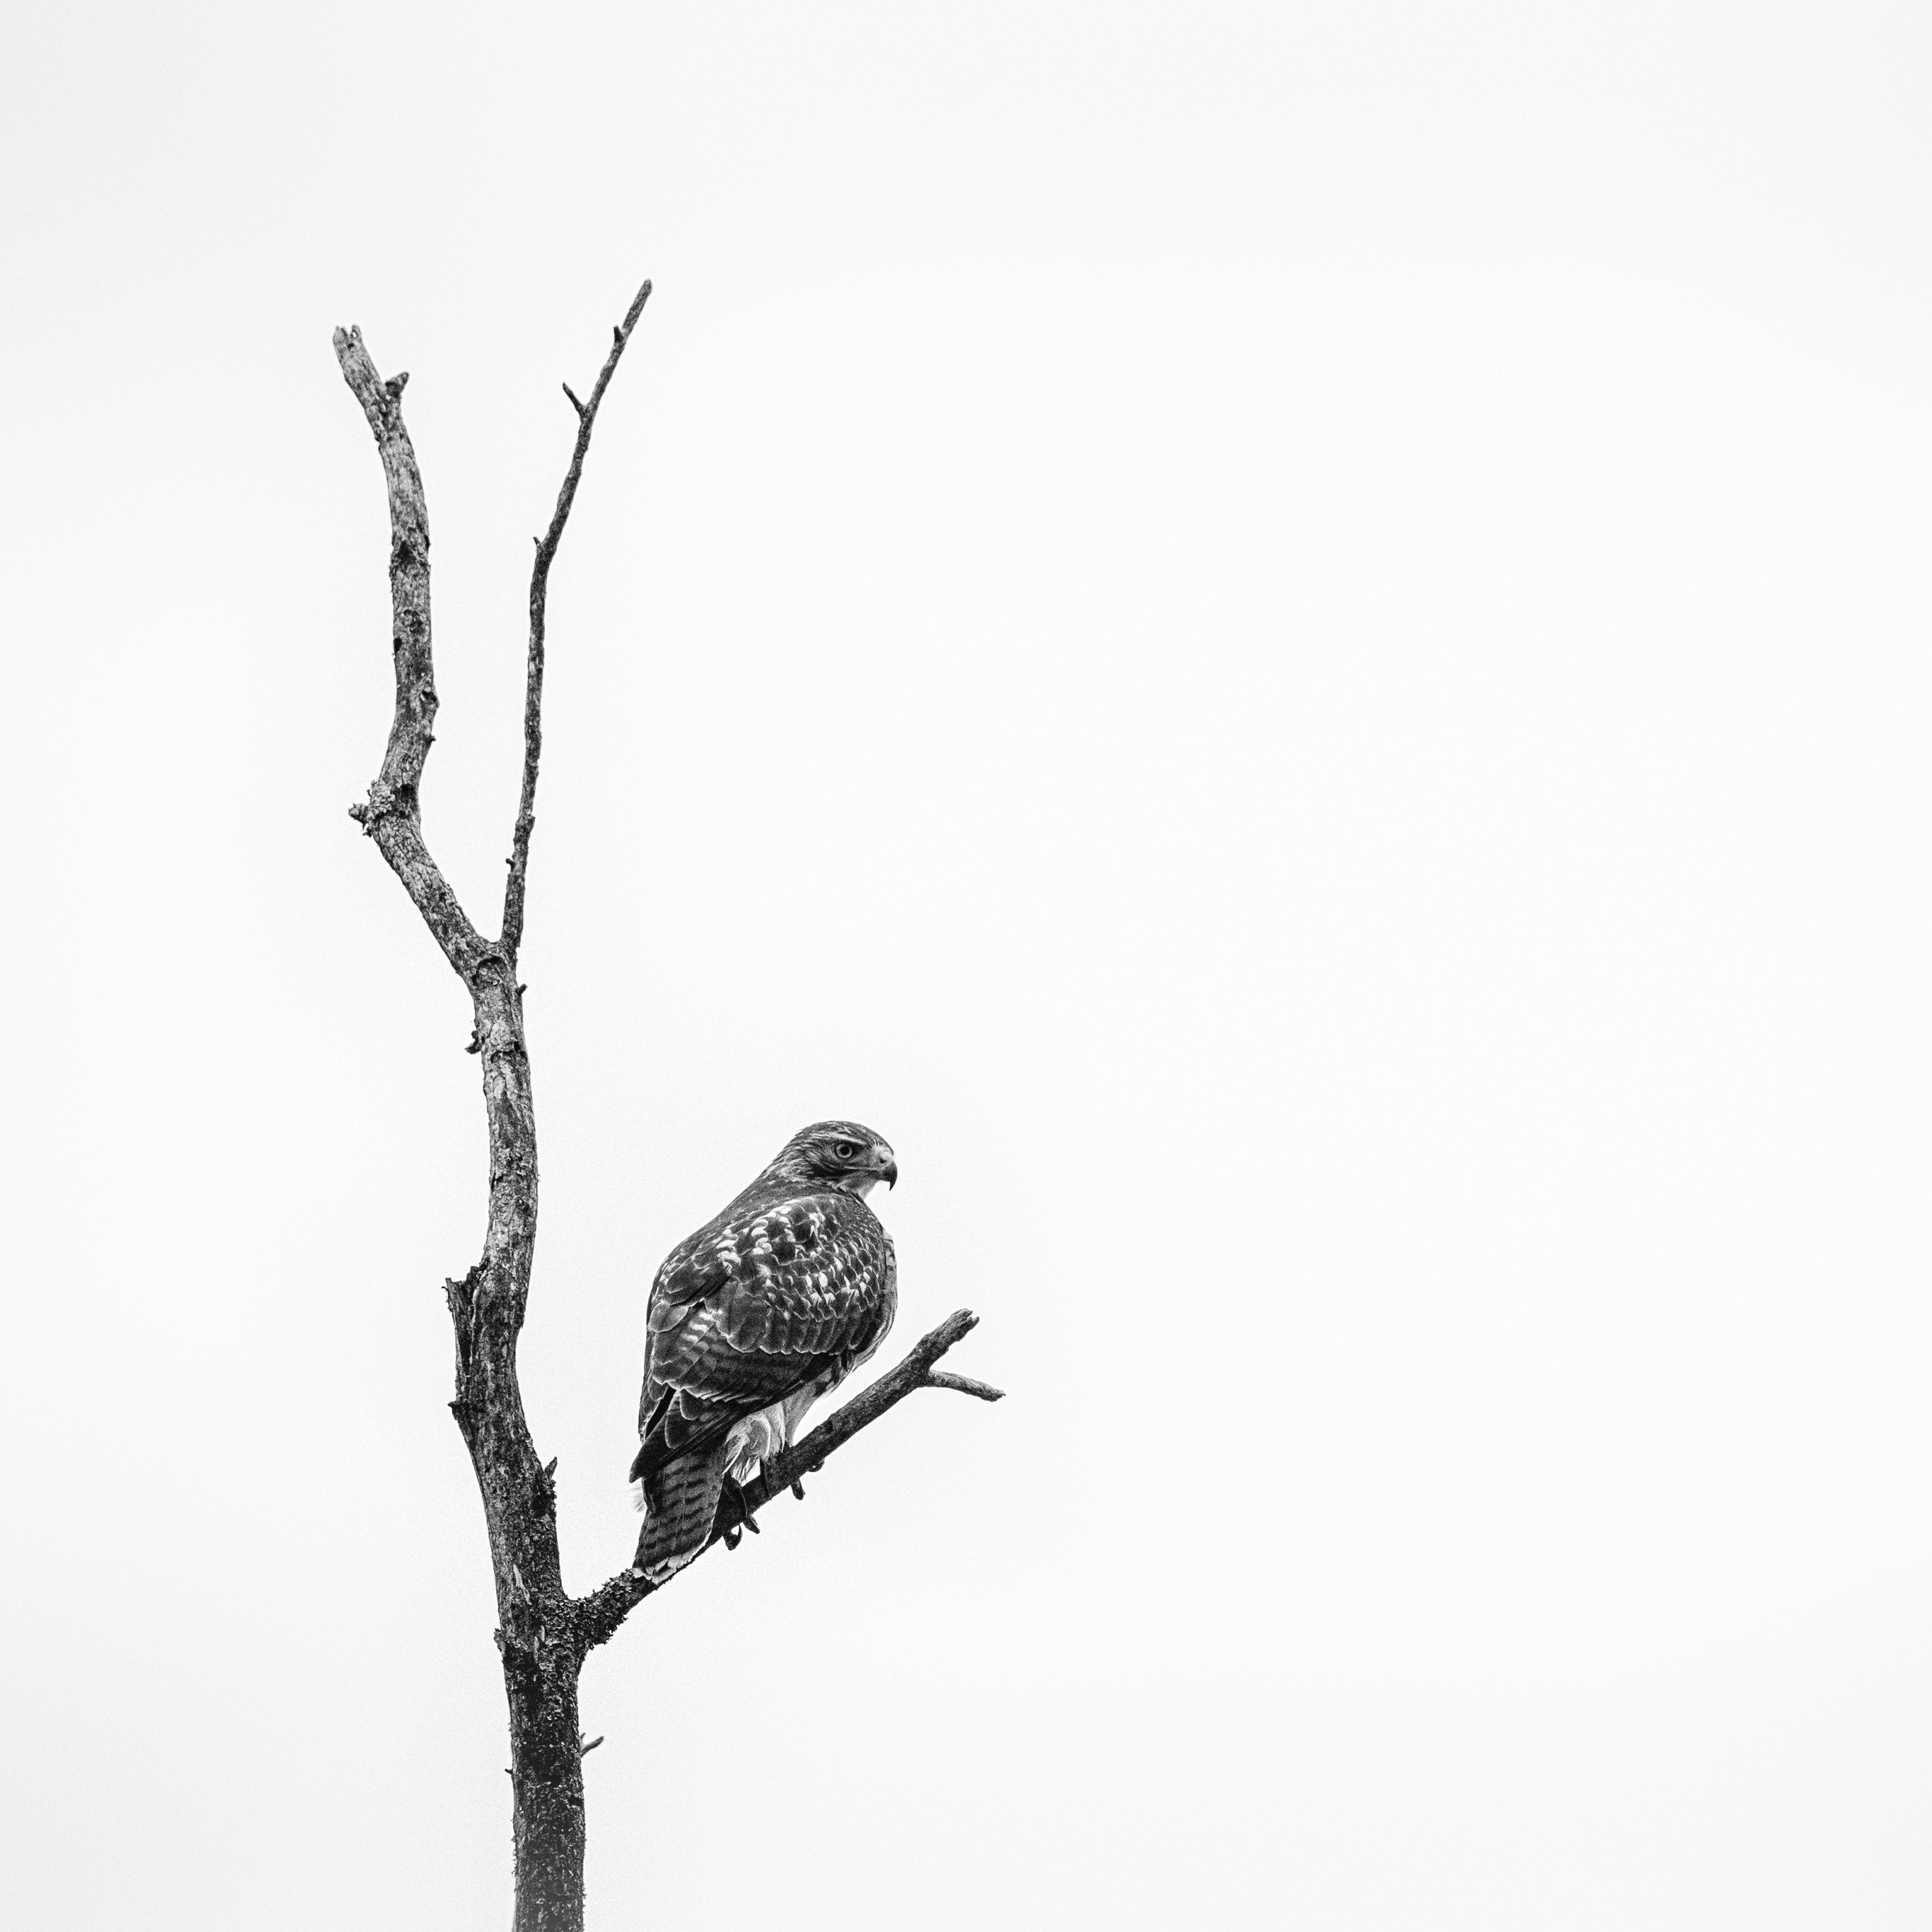 Hawk in Winter Locust